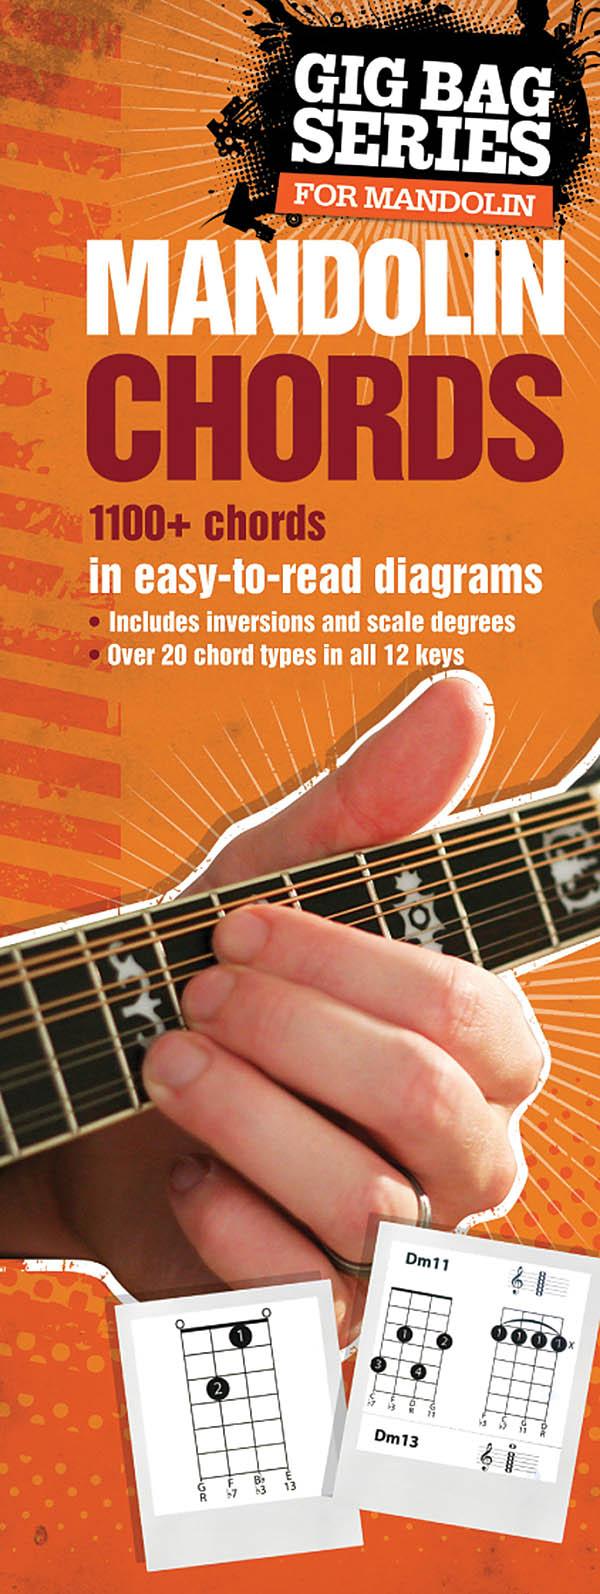 The Gig Bag Book of Mandolin Chords: Mandolin: Instrumental Reference